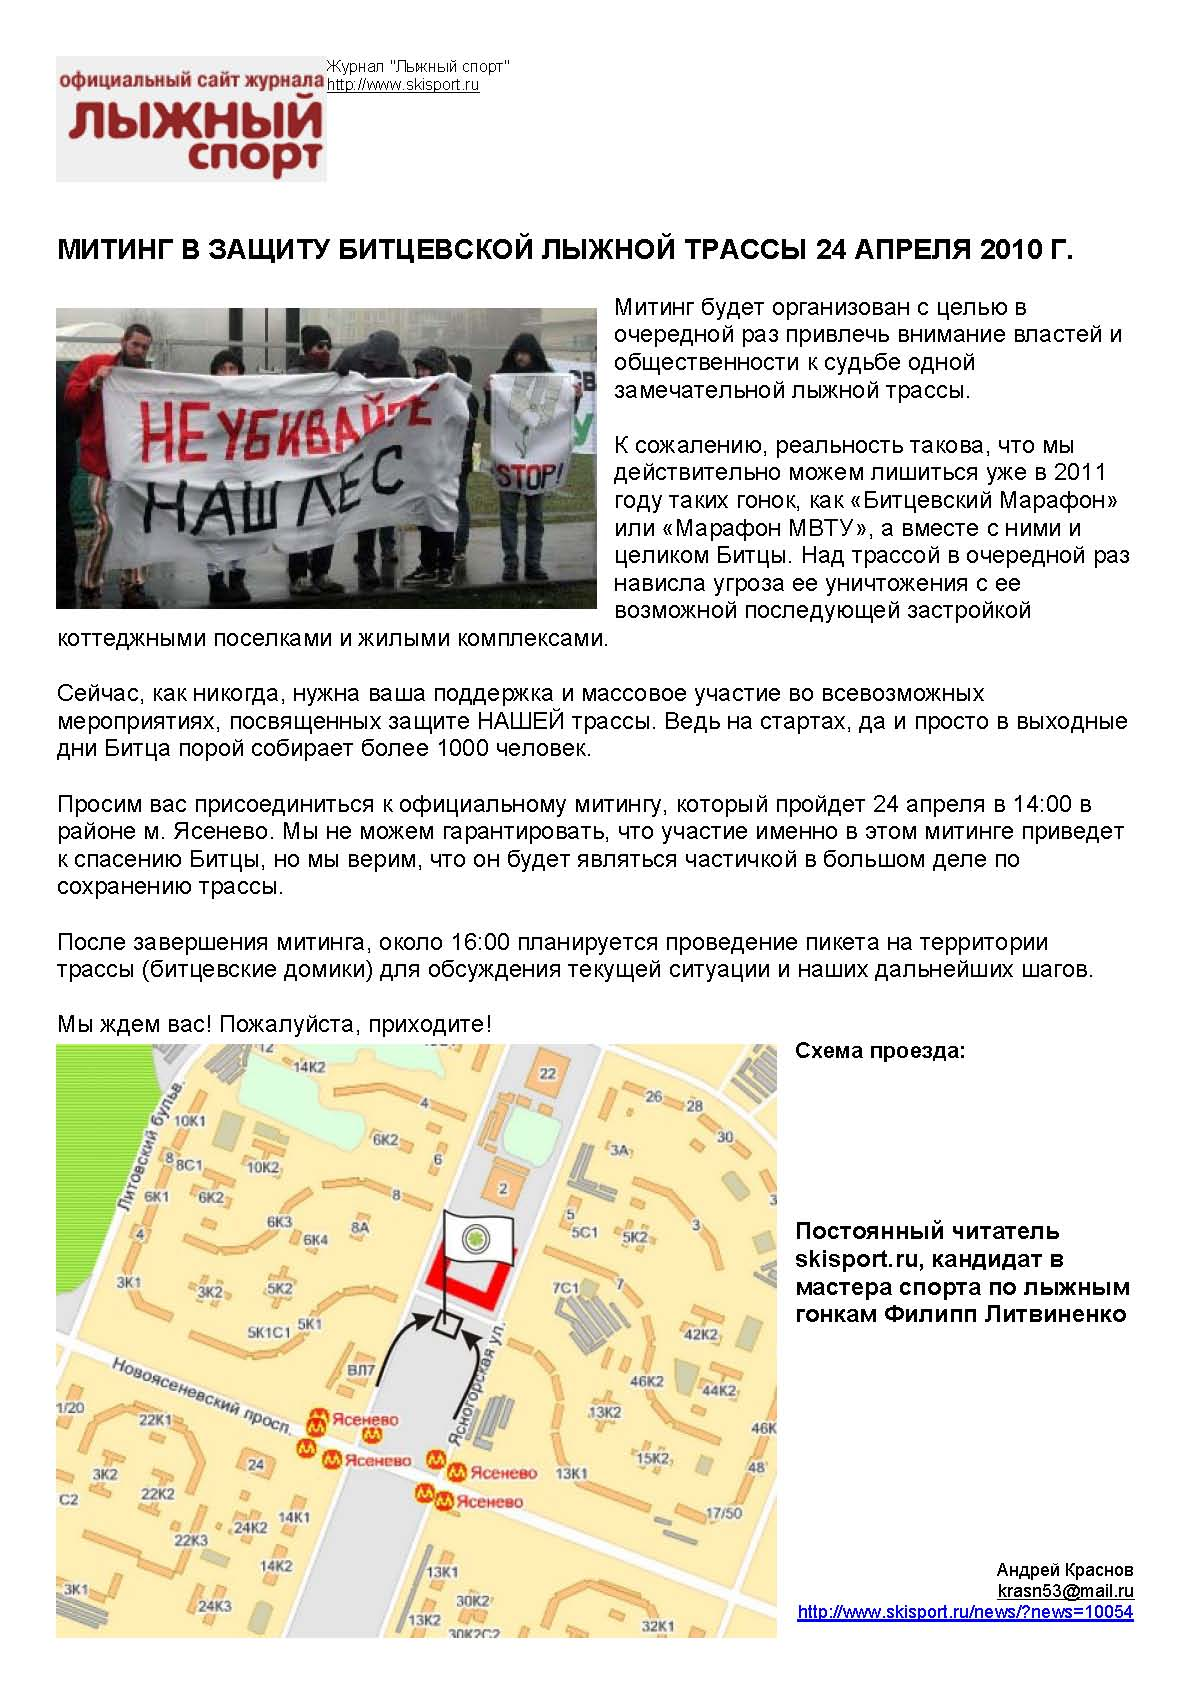 Спасем Битцу - митинг и пикет 24 апреля